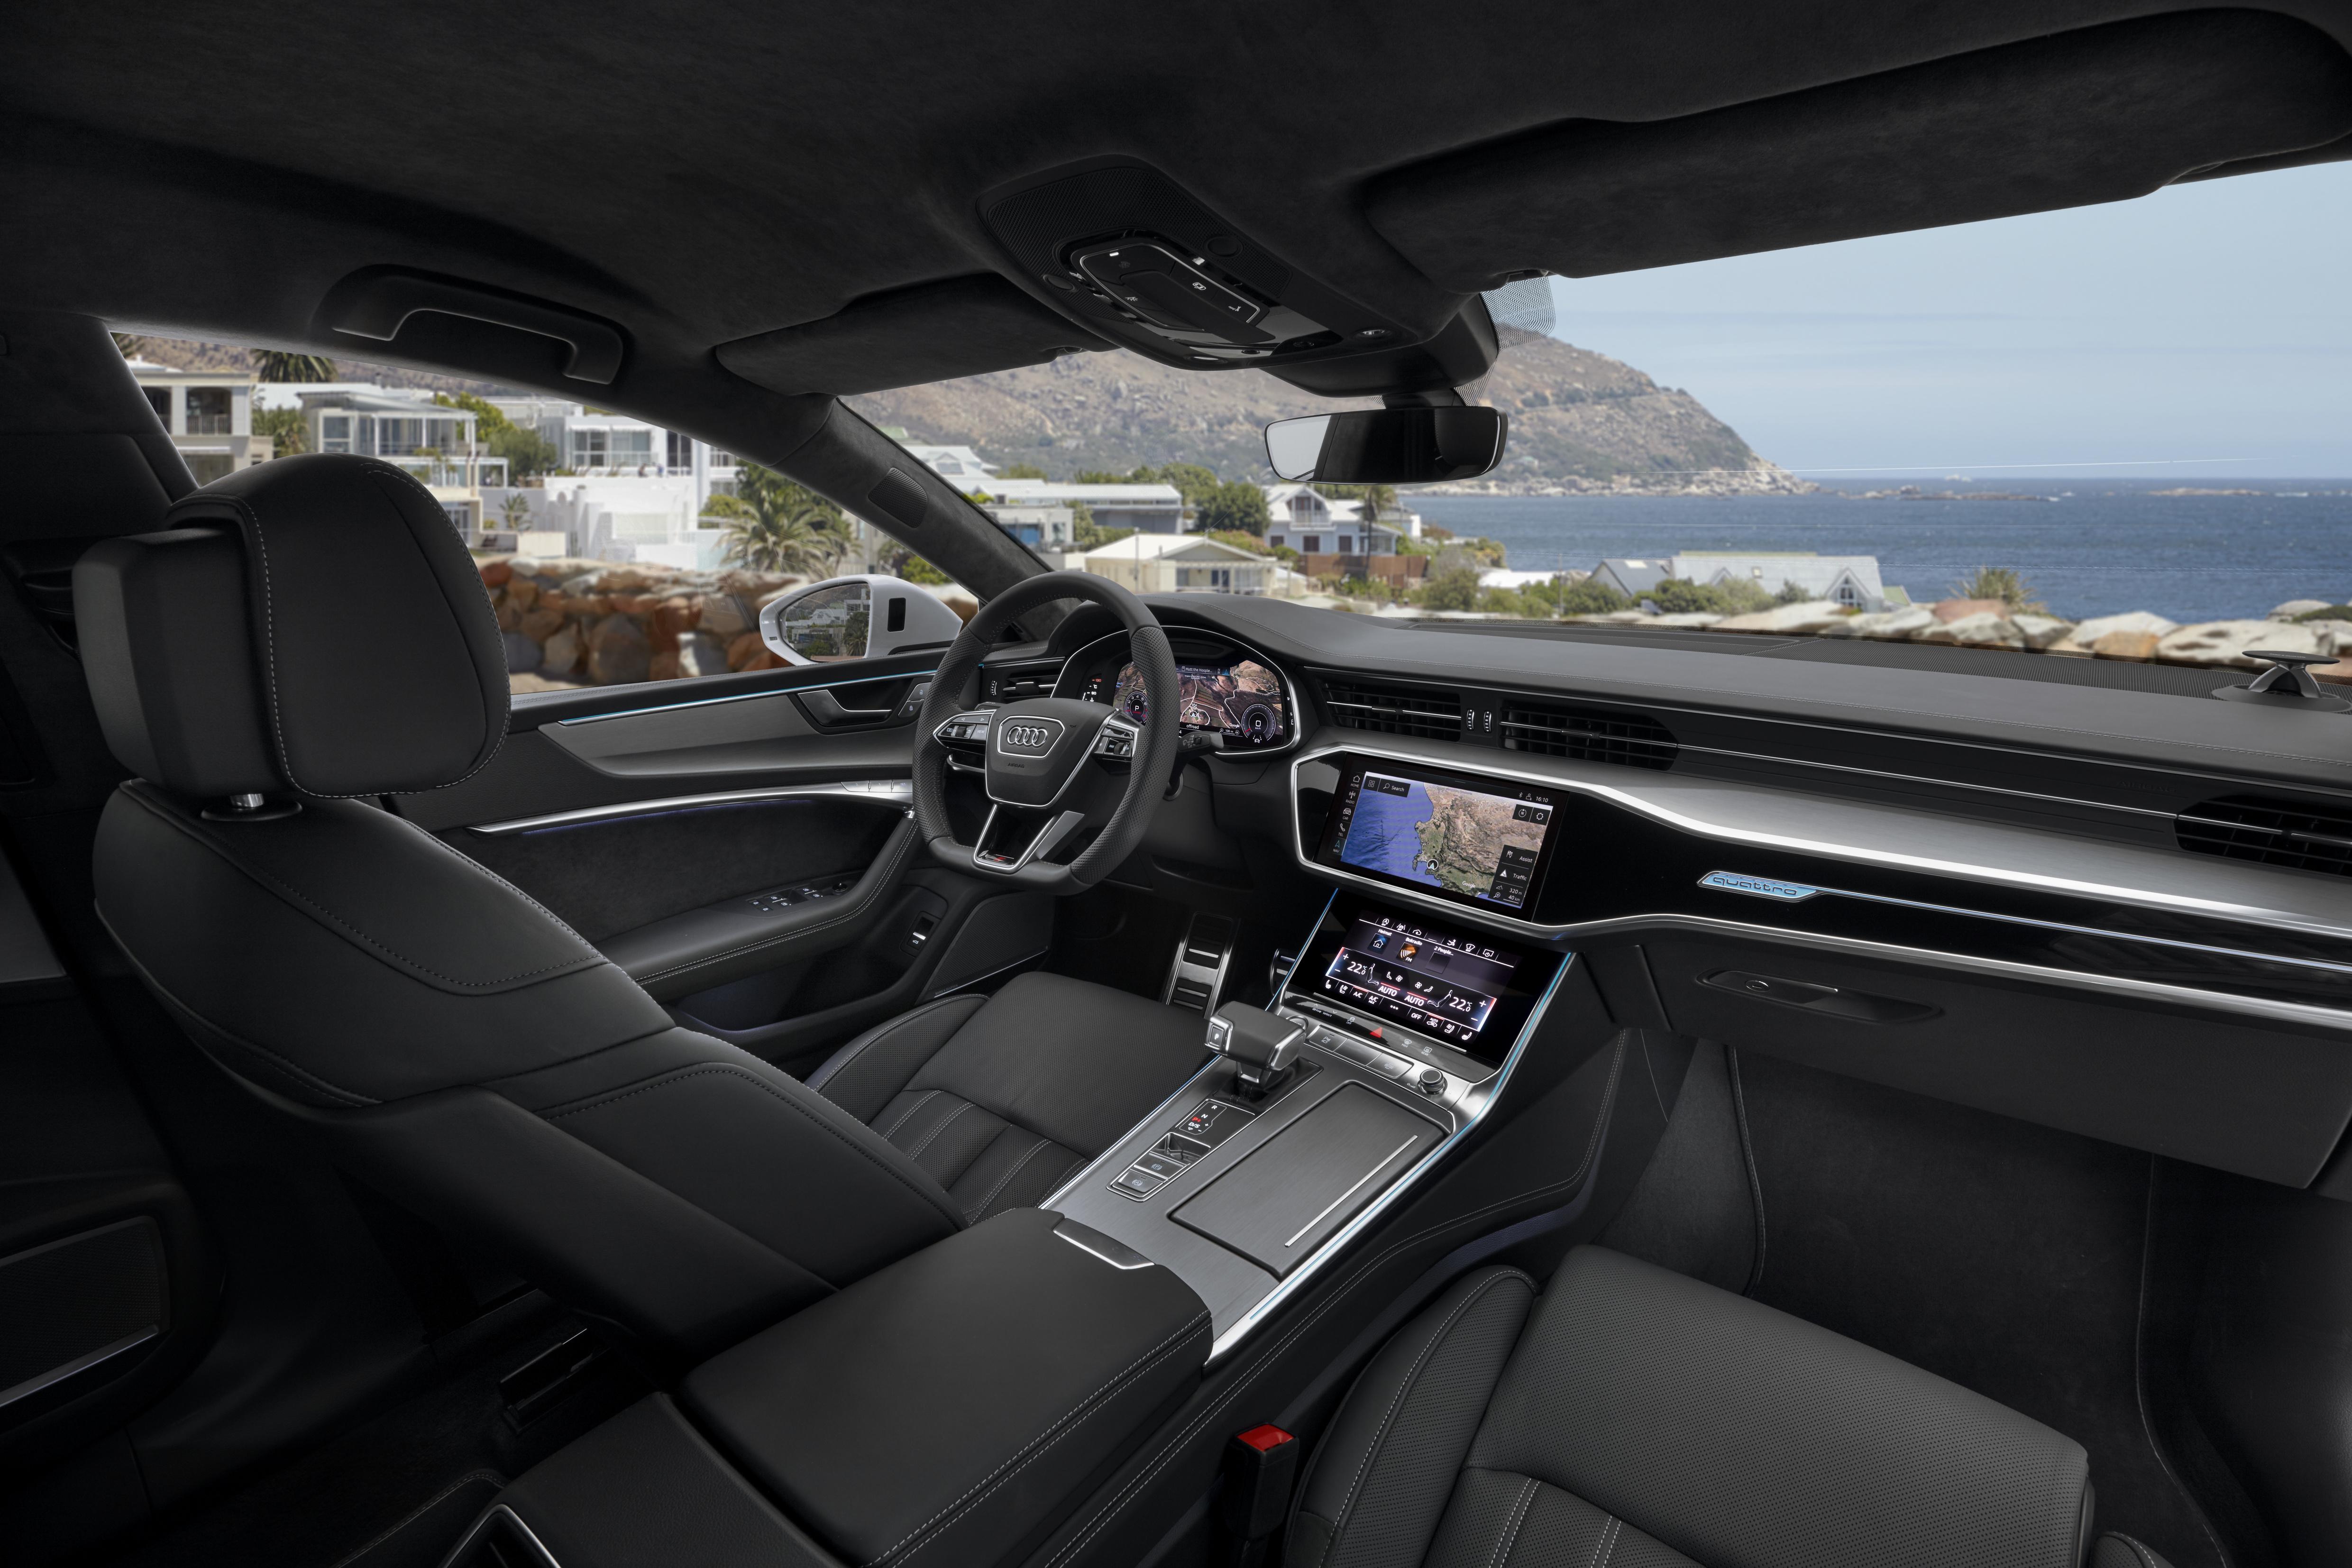 Nowe Audi A7 Sportback Business Journal Polska